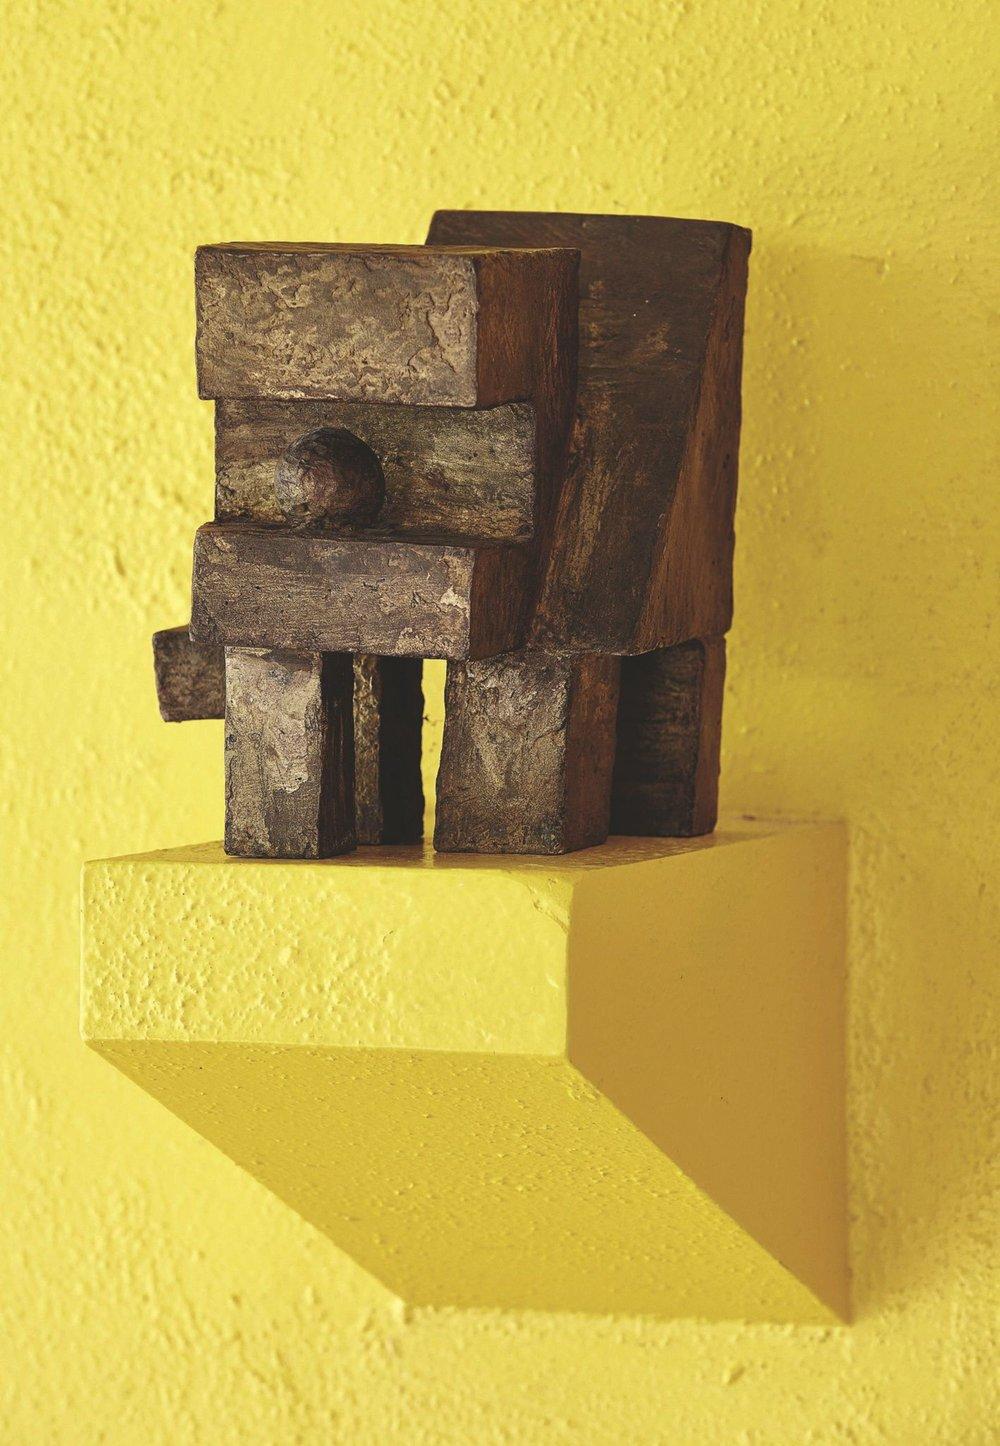 André Wogenscky_une-sculpture-en-bois_5361337.jpg